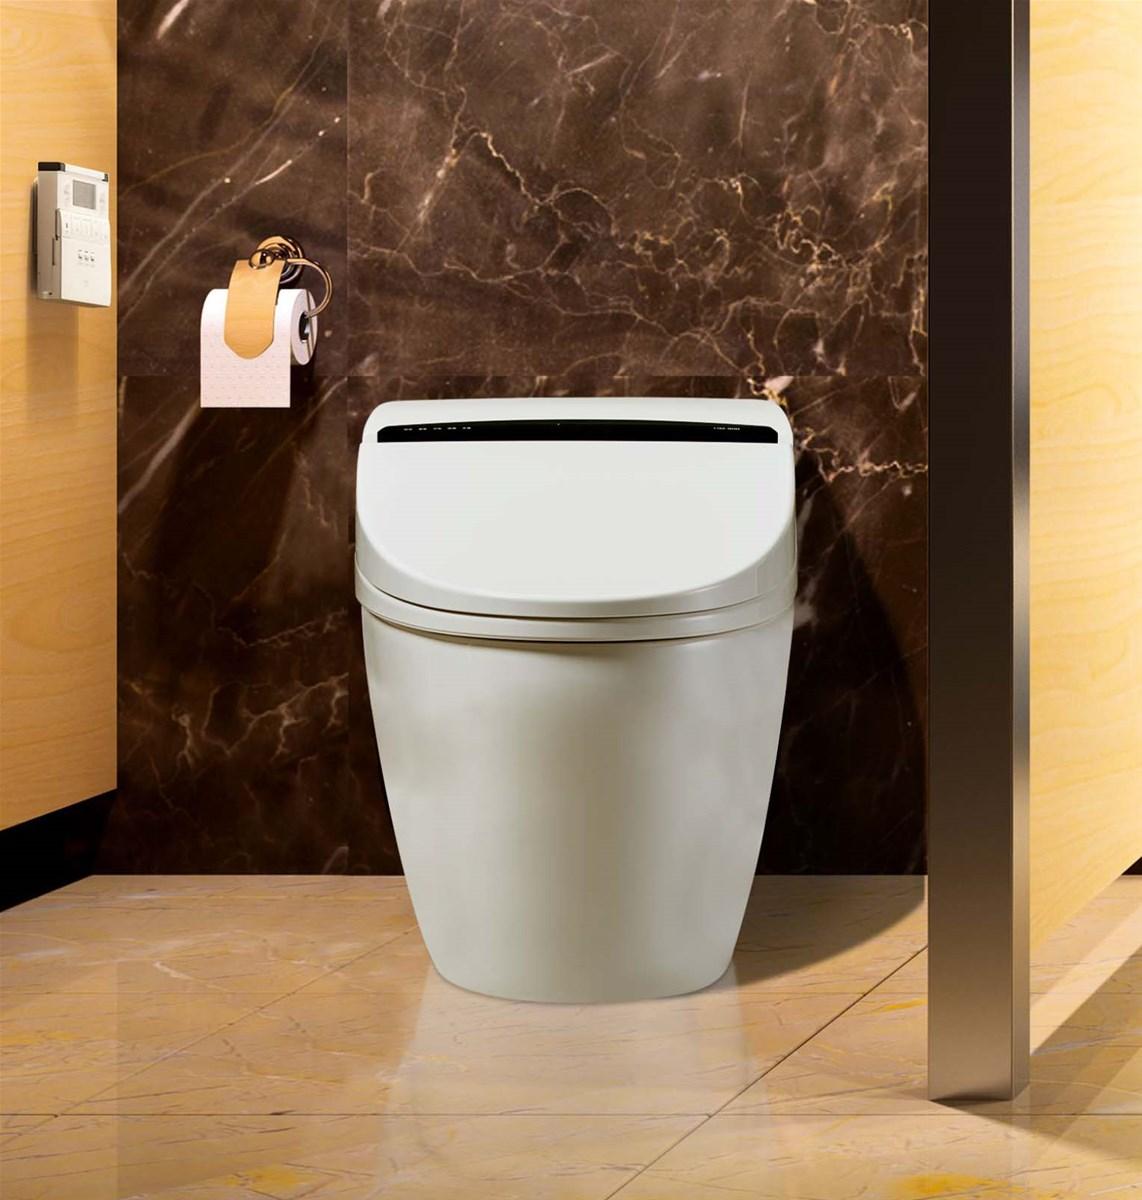 Awe Inspiring Hm800 Elite Washdown Automatic Cleaning Smart Lavatory Ibusinesslaw Wood Chair Design Ideas Ibusinesslaworg